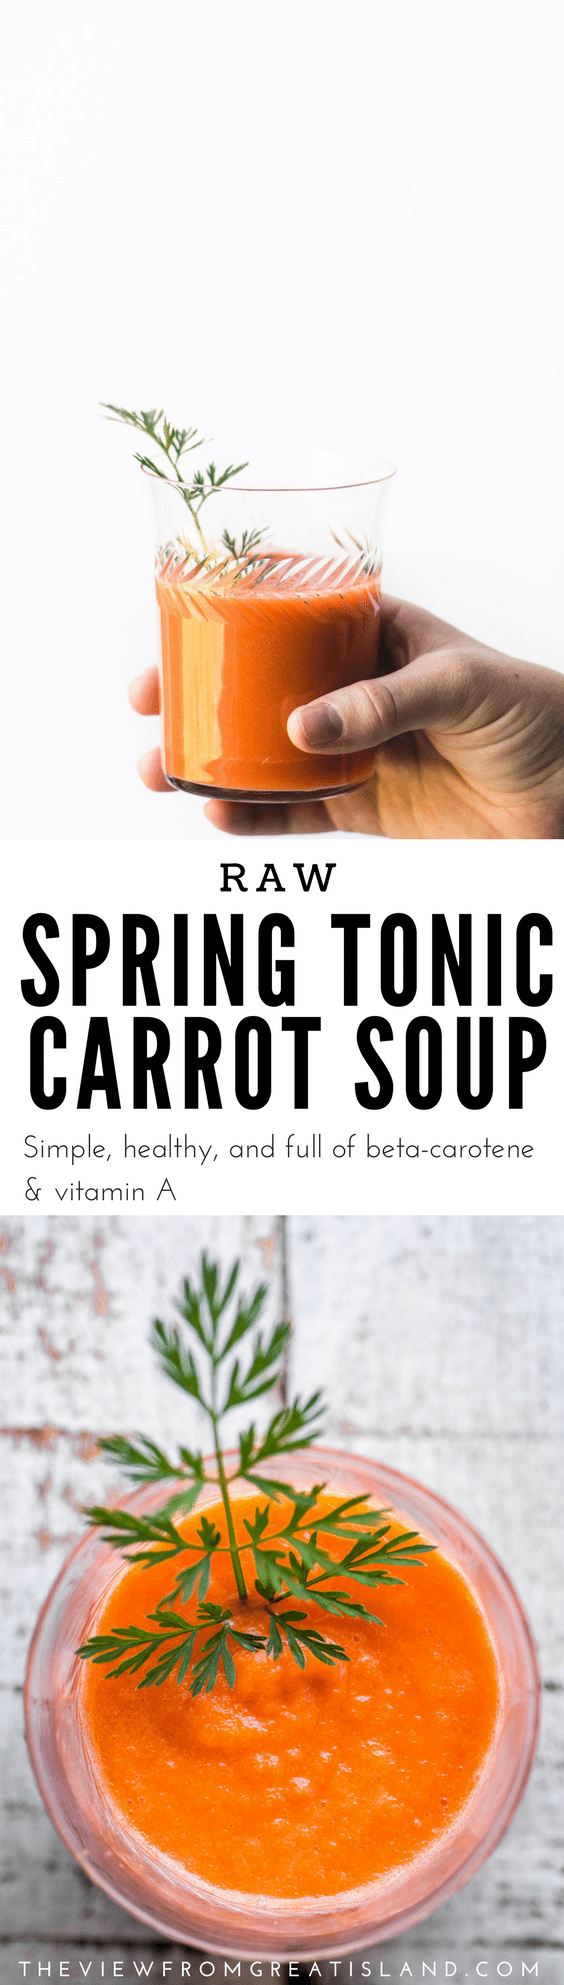 Spring Tonic Carrot Soup ~ a vibrant beta carotene and Vitamin A rich raw soup that'll kick start you into the new season ~ are you ready? #soup #raw #carrots #carrotsoup #appetizer #tonic #healthtonic #springsoup #carrotjuice #juicing #glutenfree #whole30 #paleo #vitamixsoup #vitamix #Mothersdayrecipe #easterrecipe #passoverrecipe #healthysoup